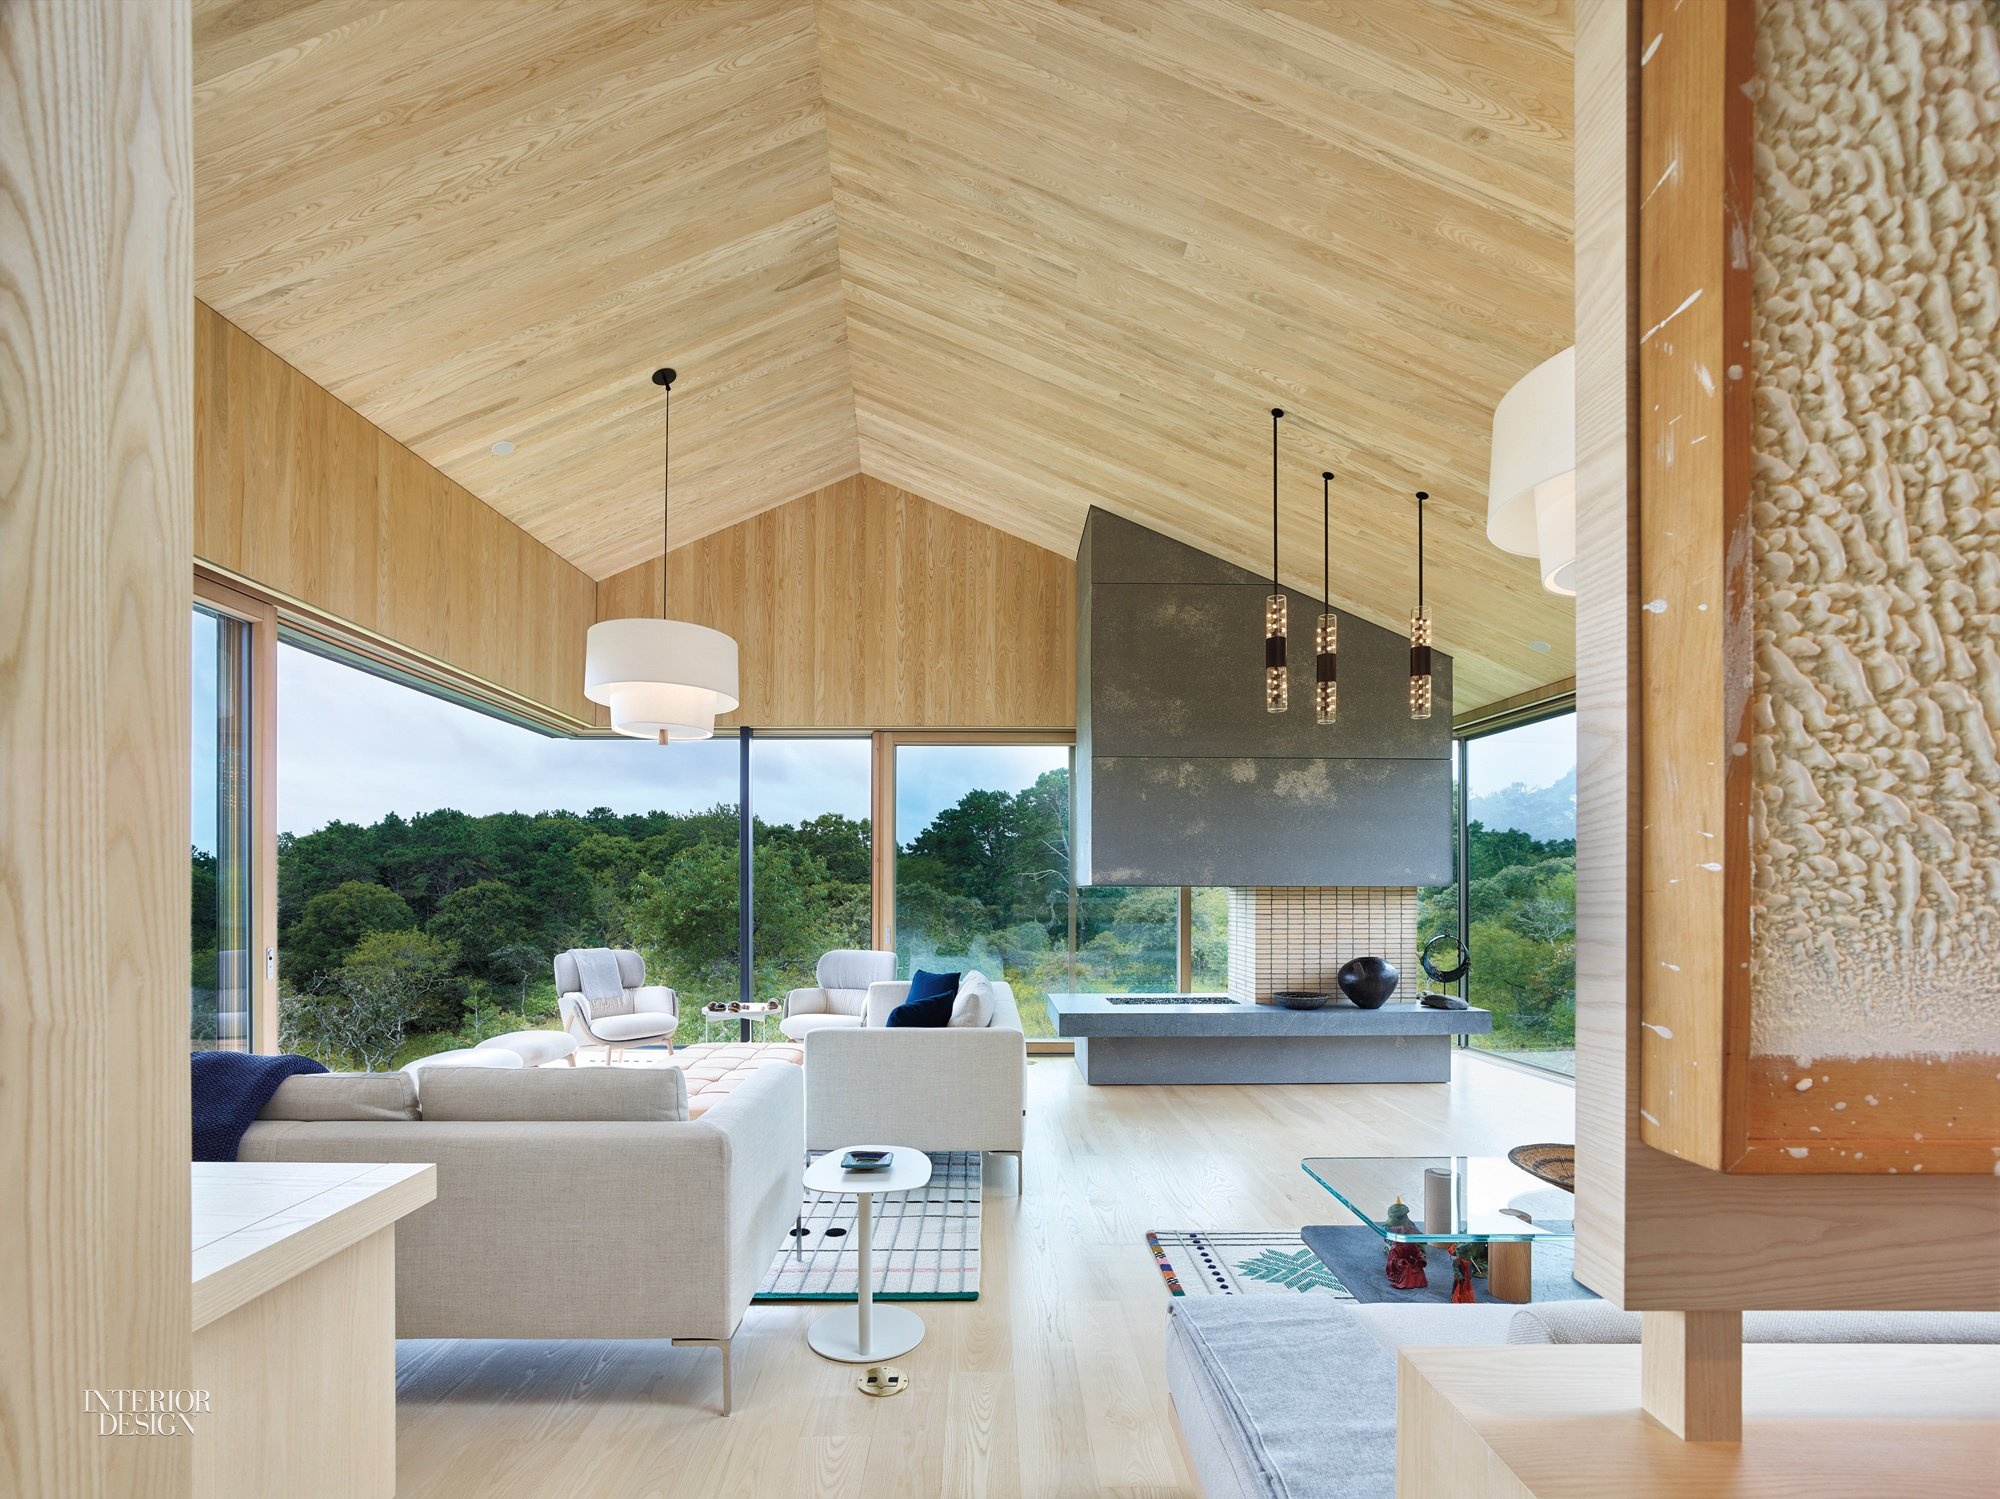 6 Simply Amazing Family-Friendly Spaces | Interior Design Magazine